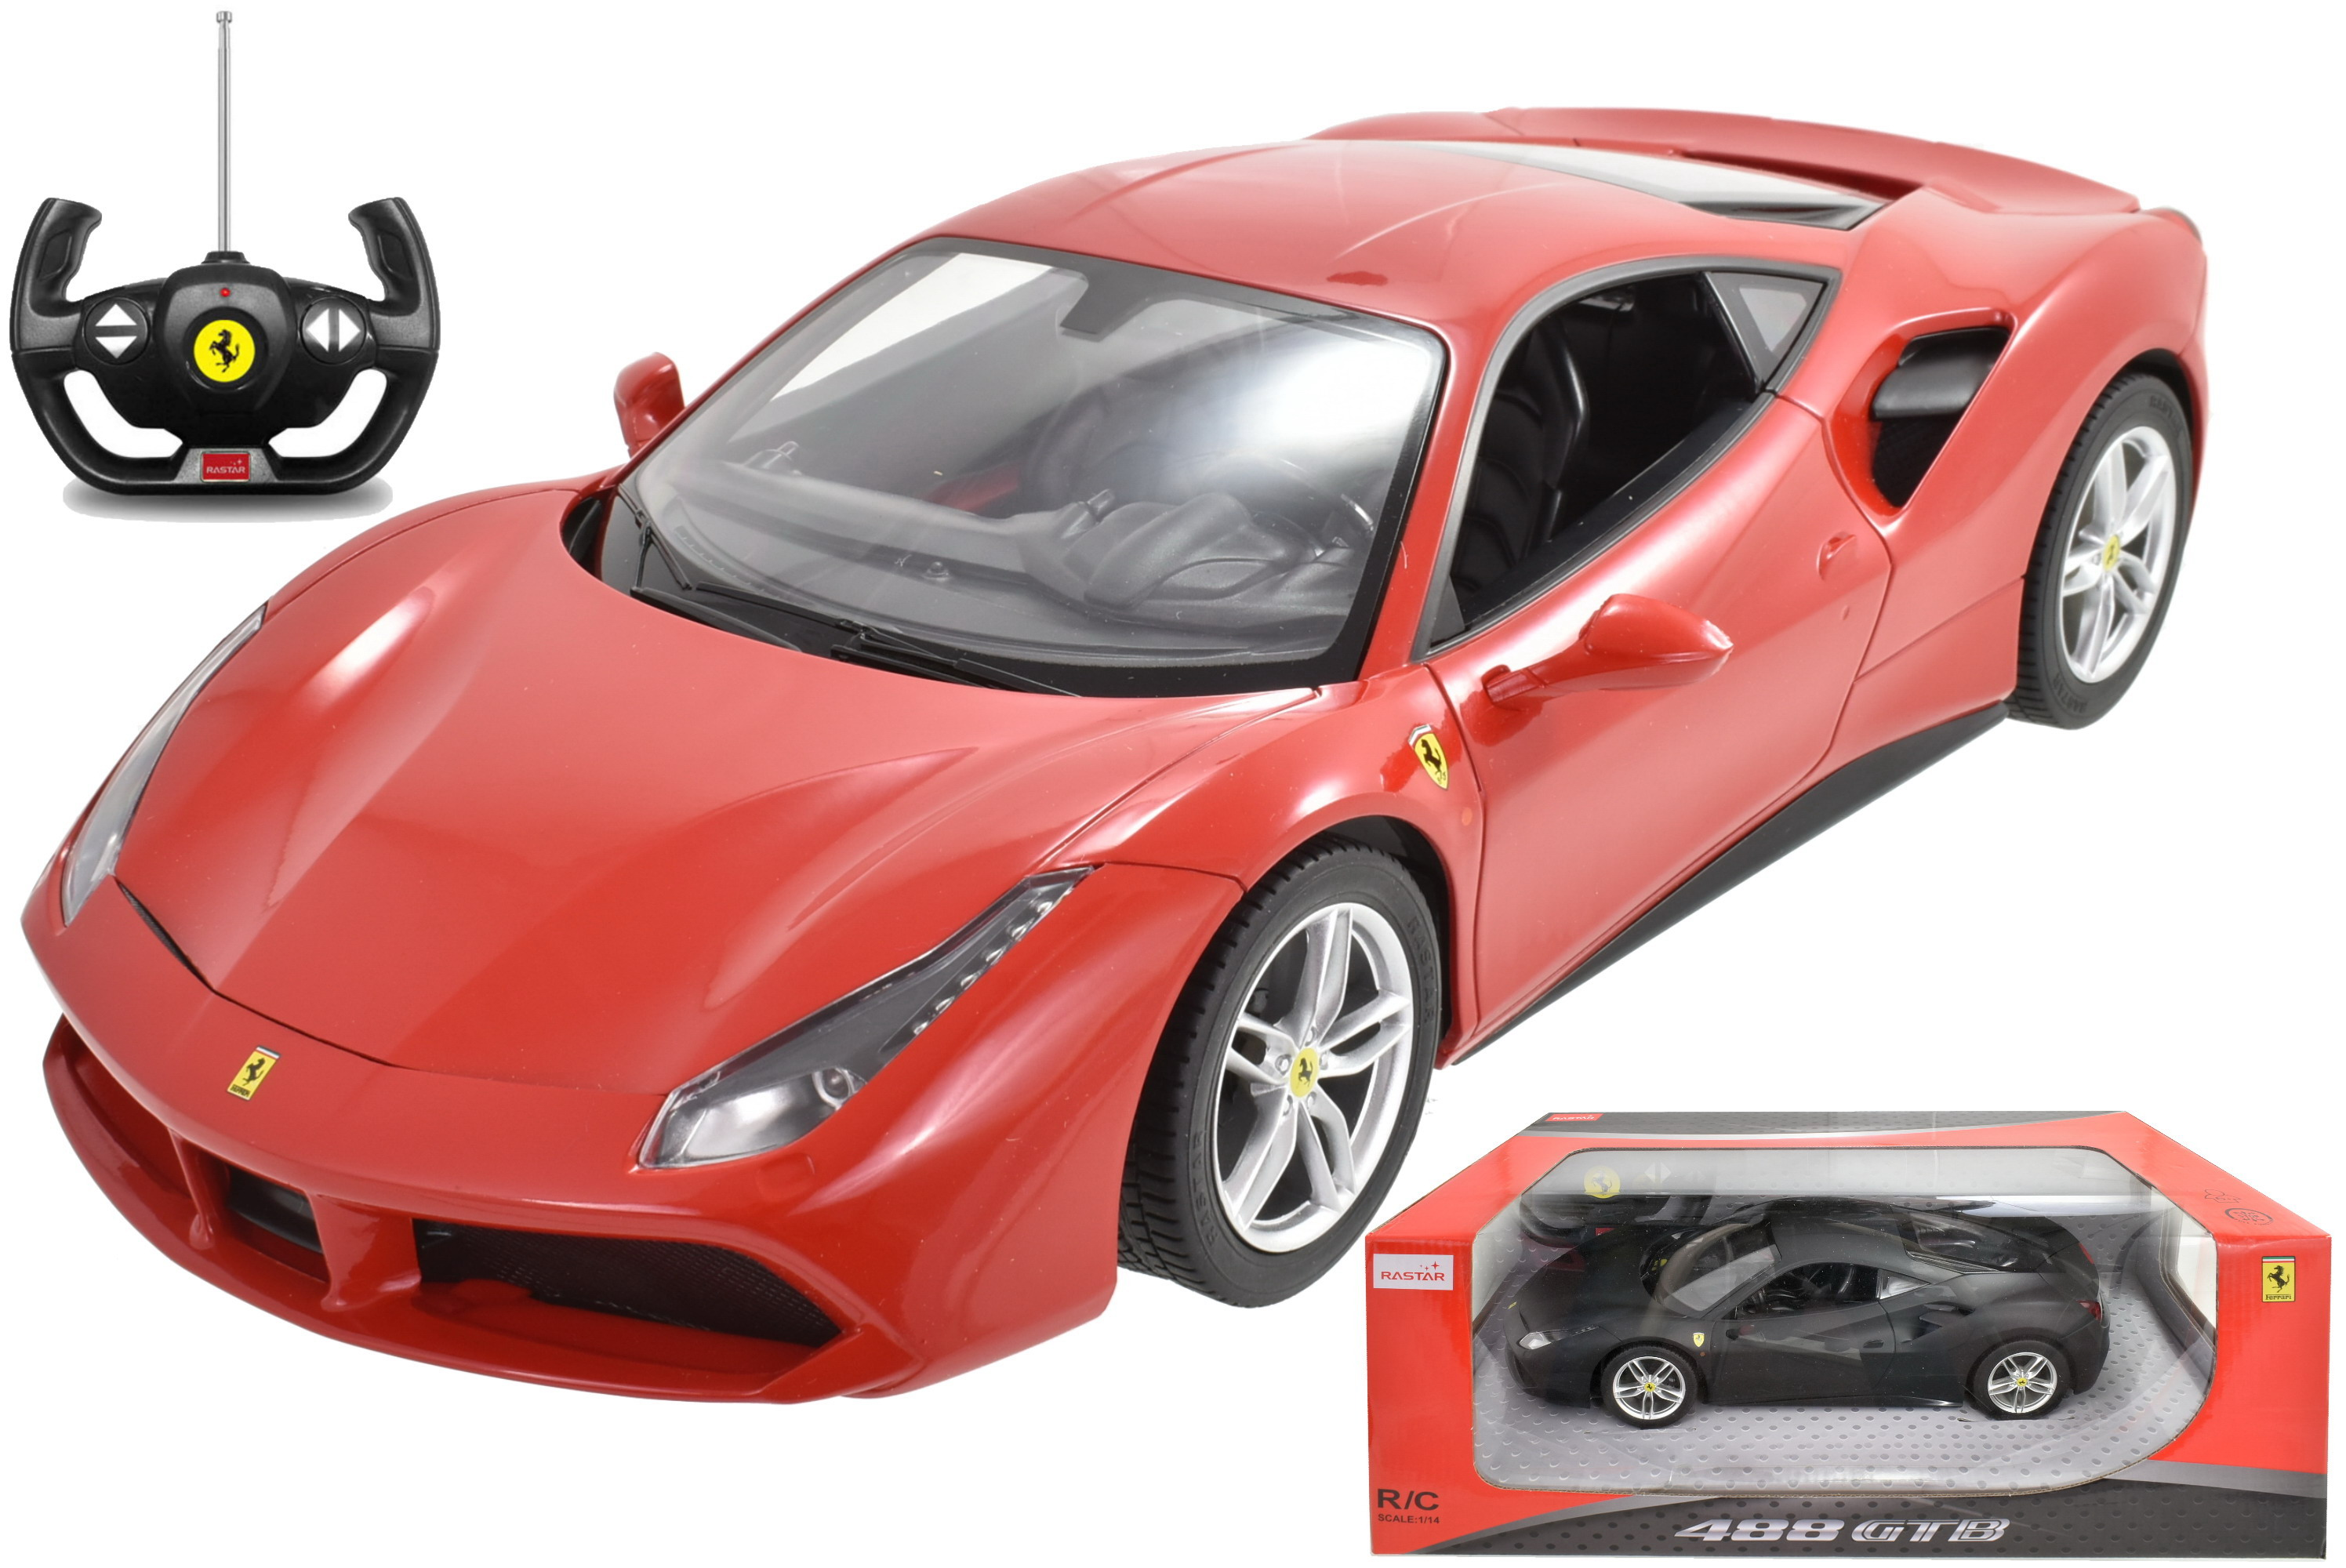 1:14sc R/C Ferrari 488 Gtb